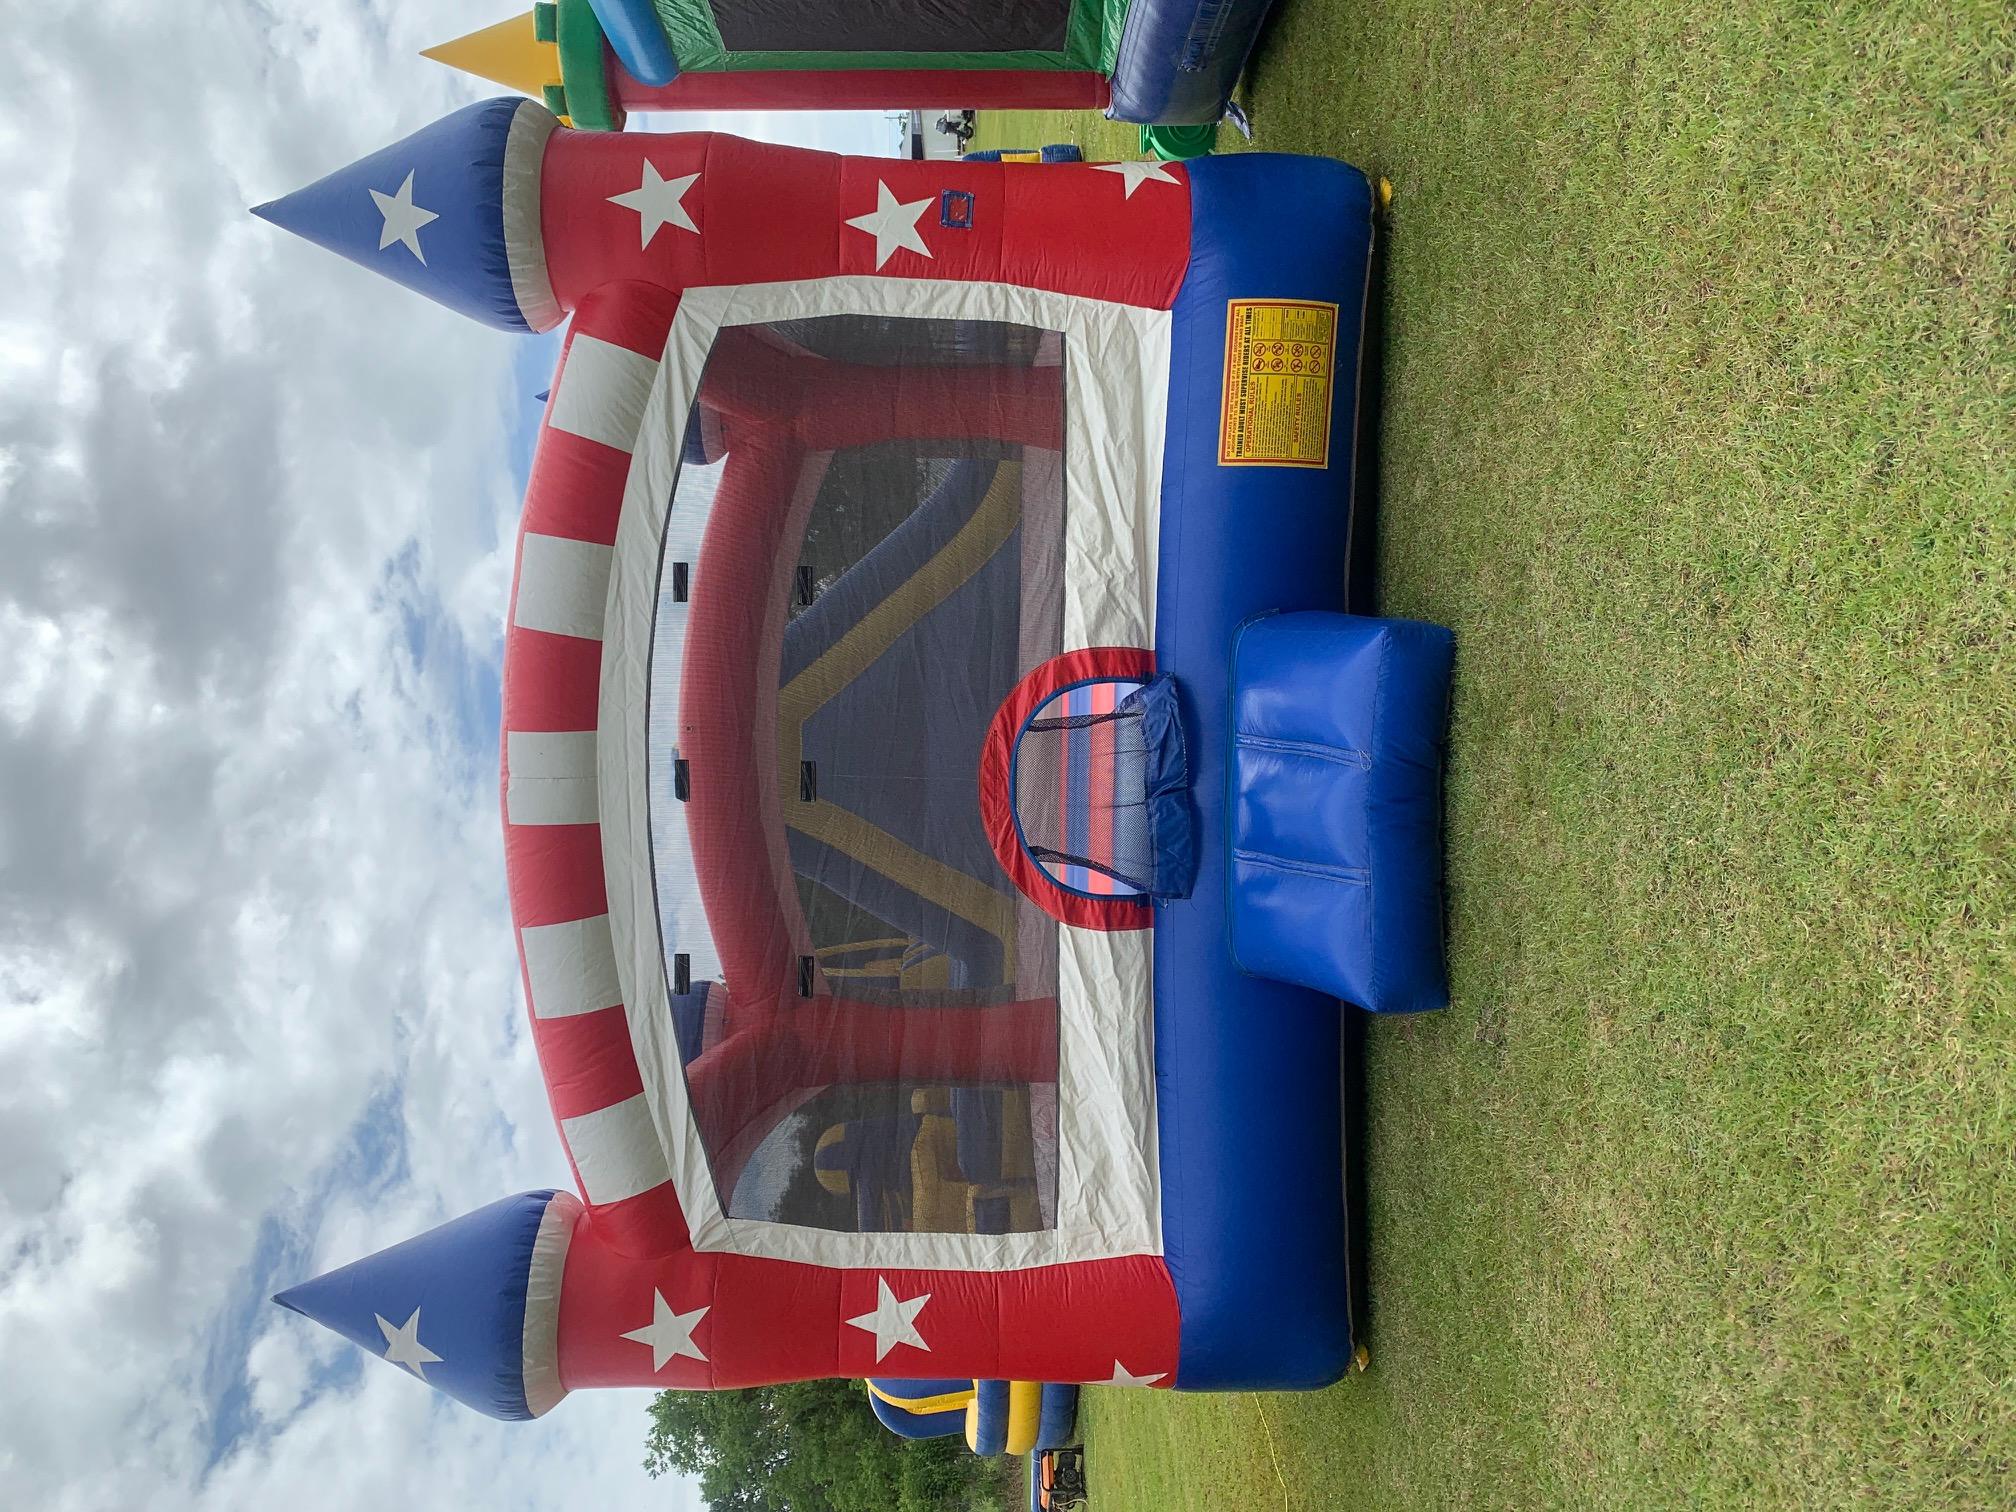 Captain America Bounce House